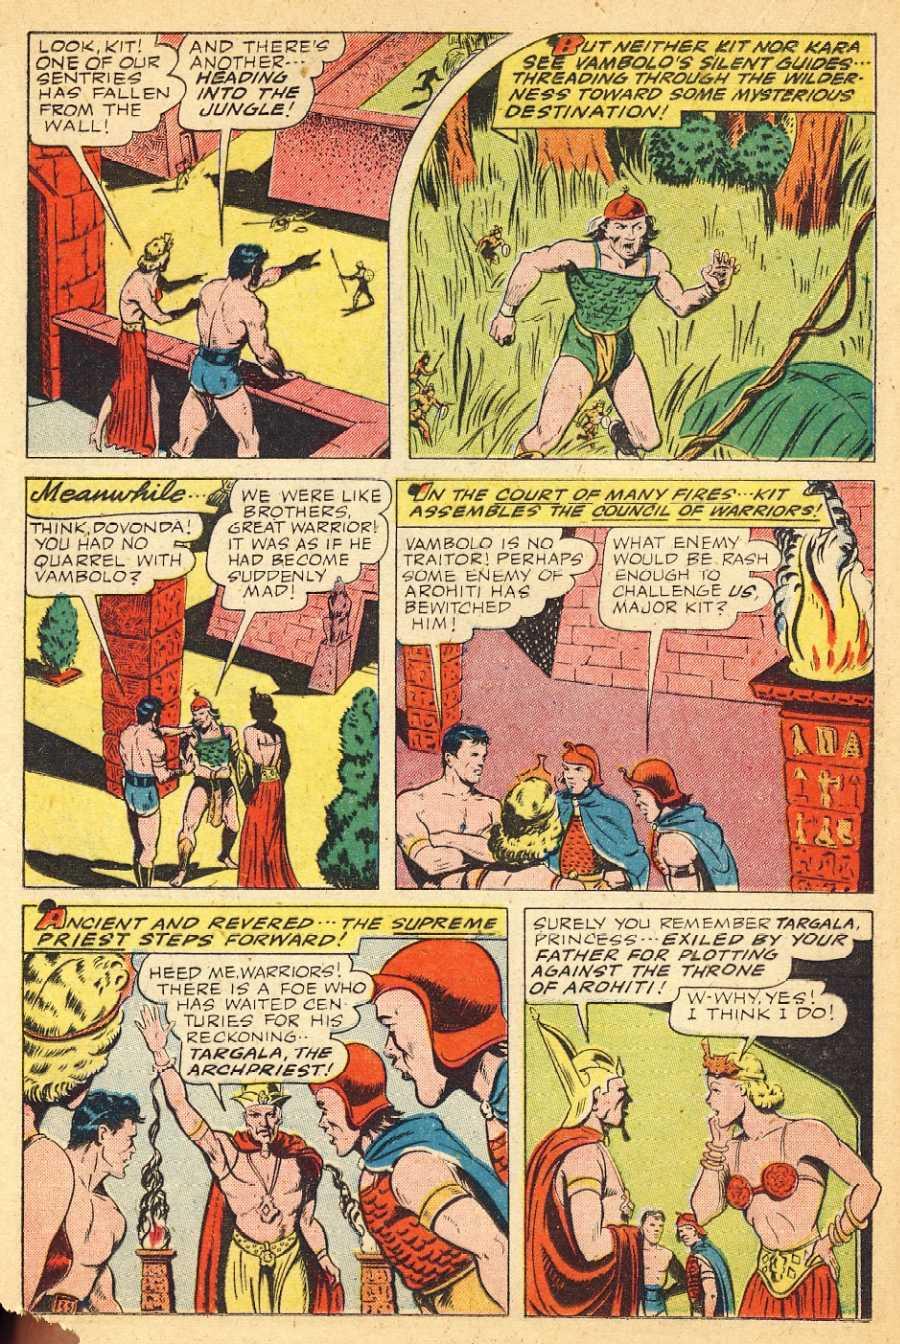 The Comic Book Catacombs: Kara the Jungle Princess (Better/Standard; 1945)